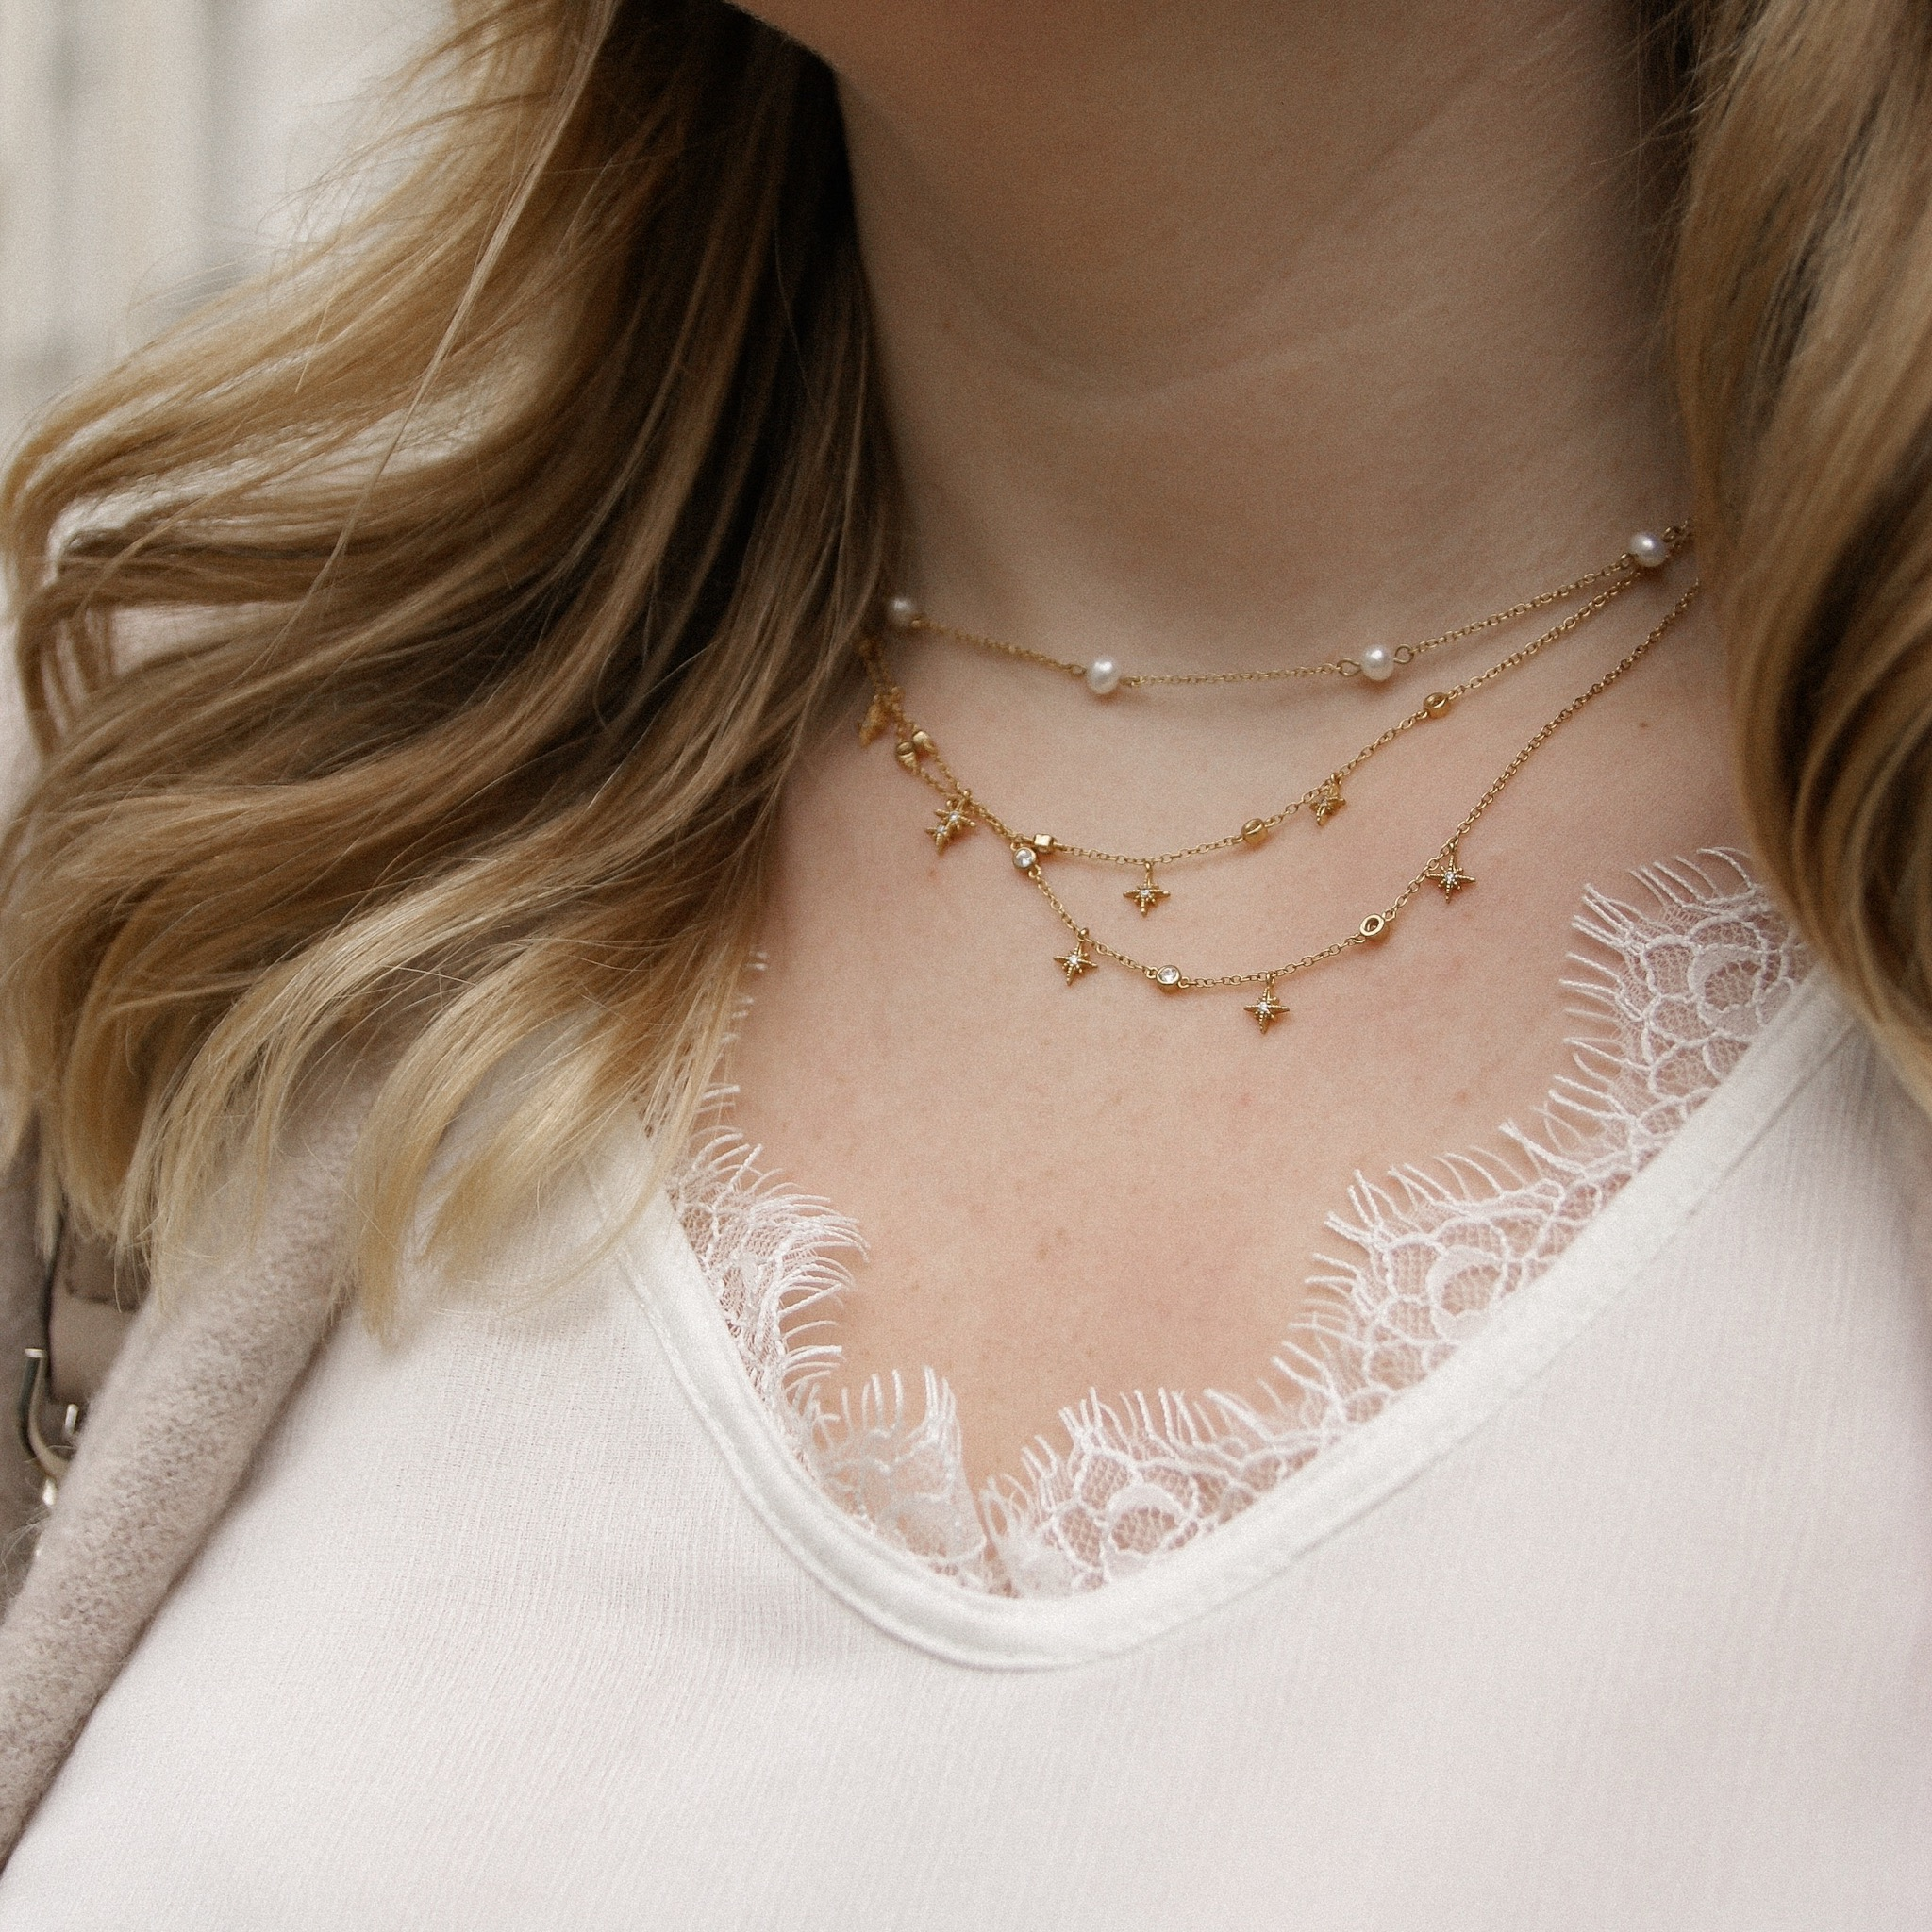 Safira necklace